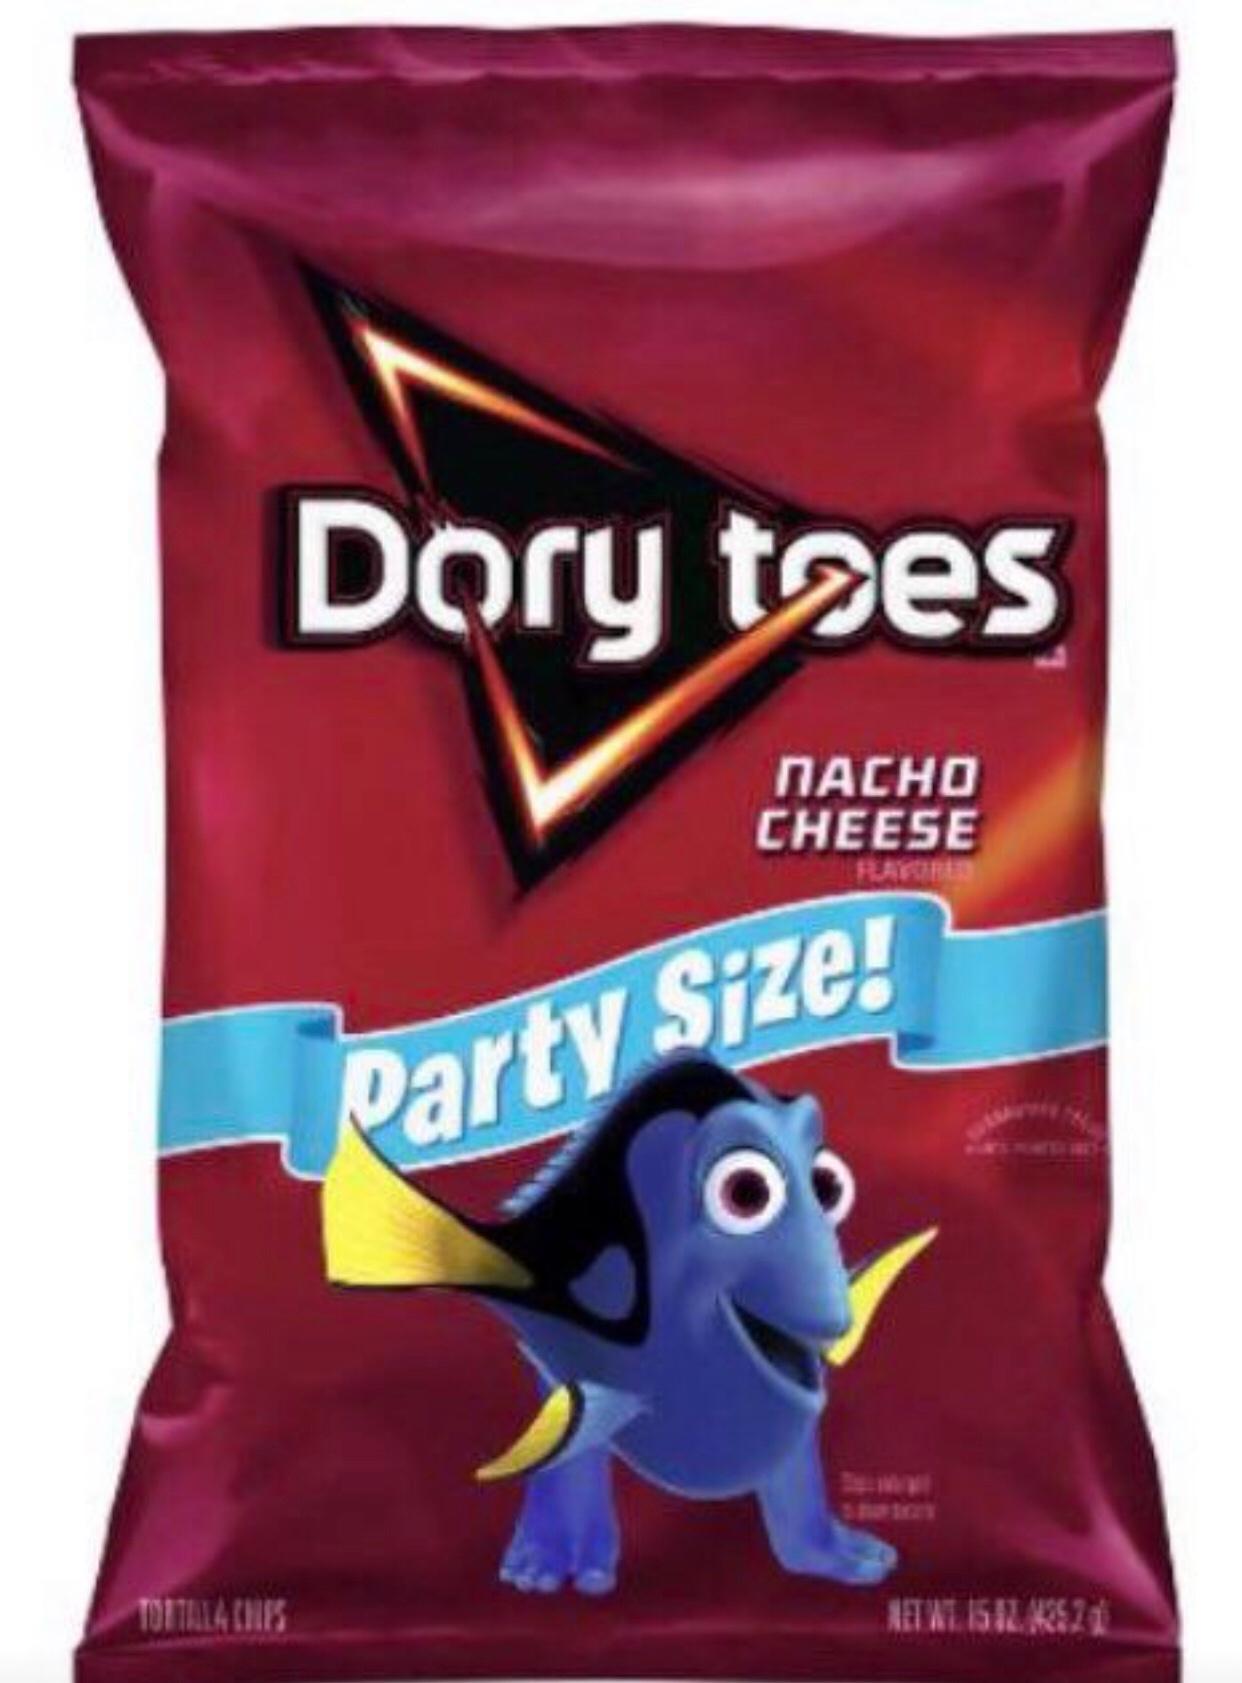 I love dem dory toes - meme